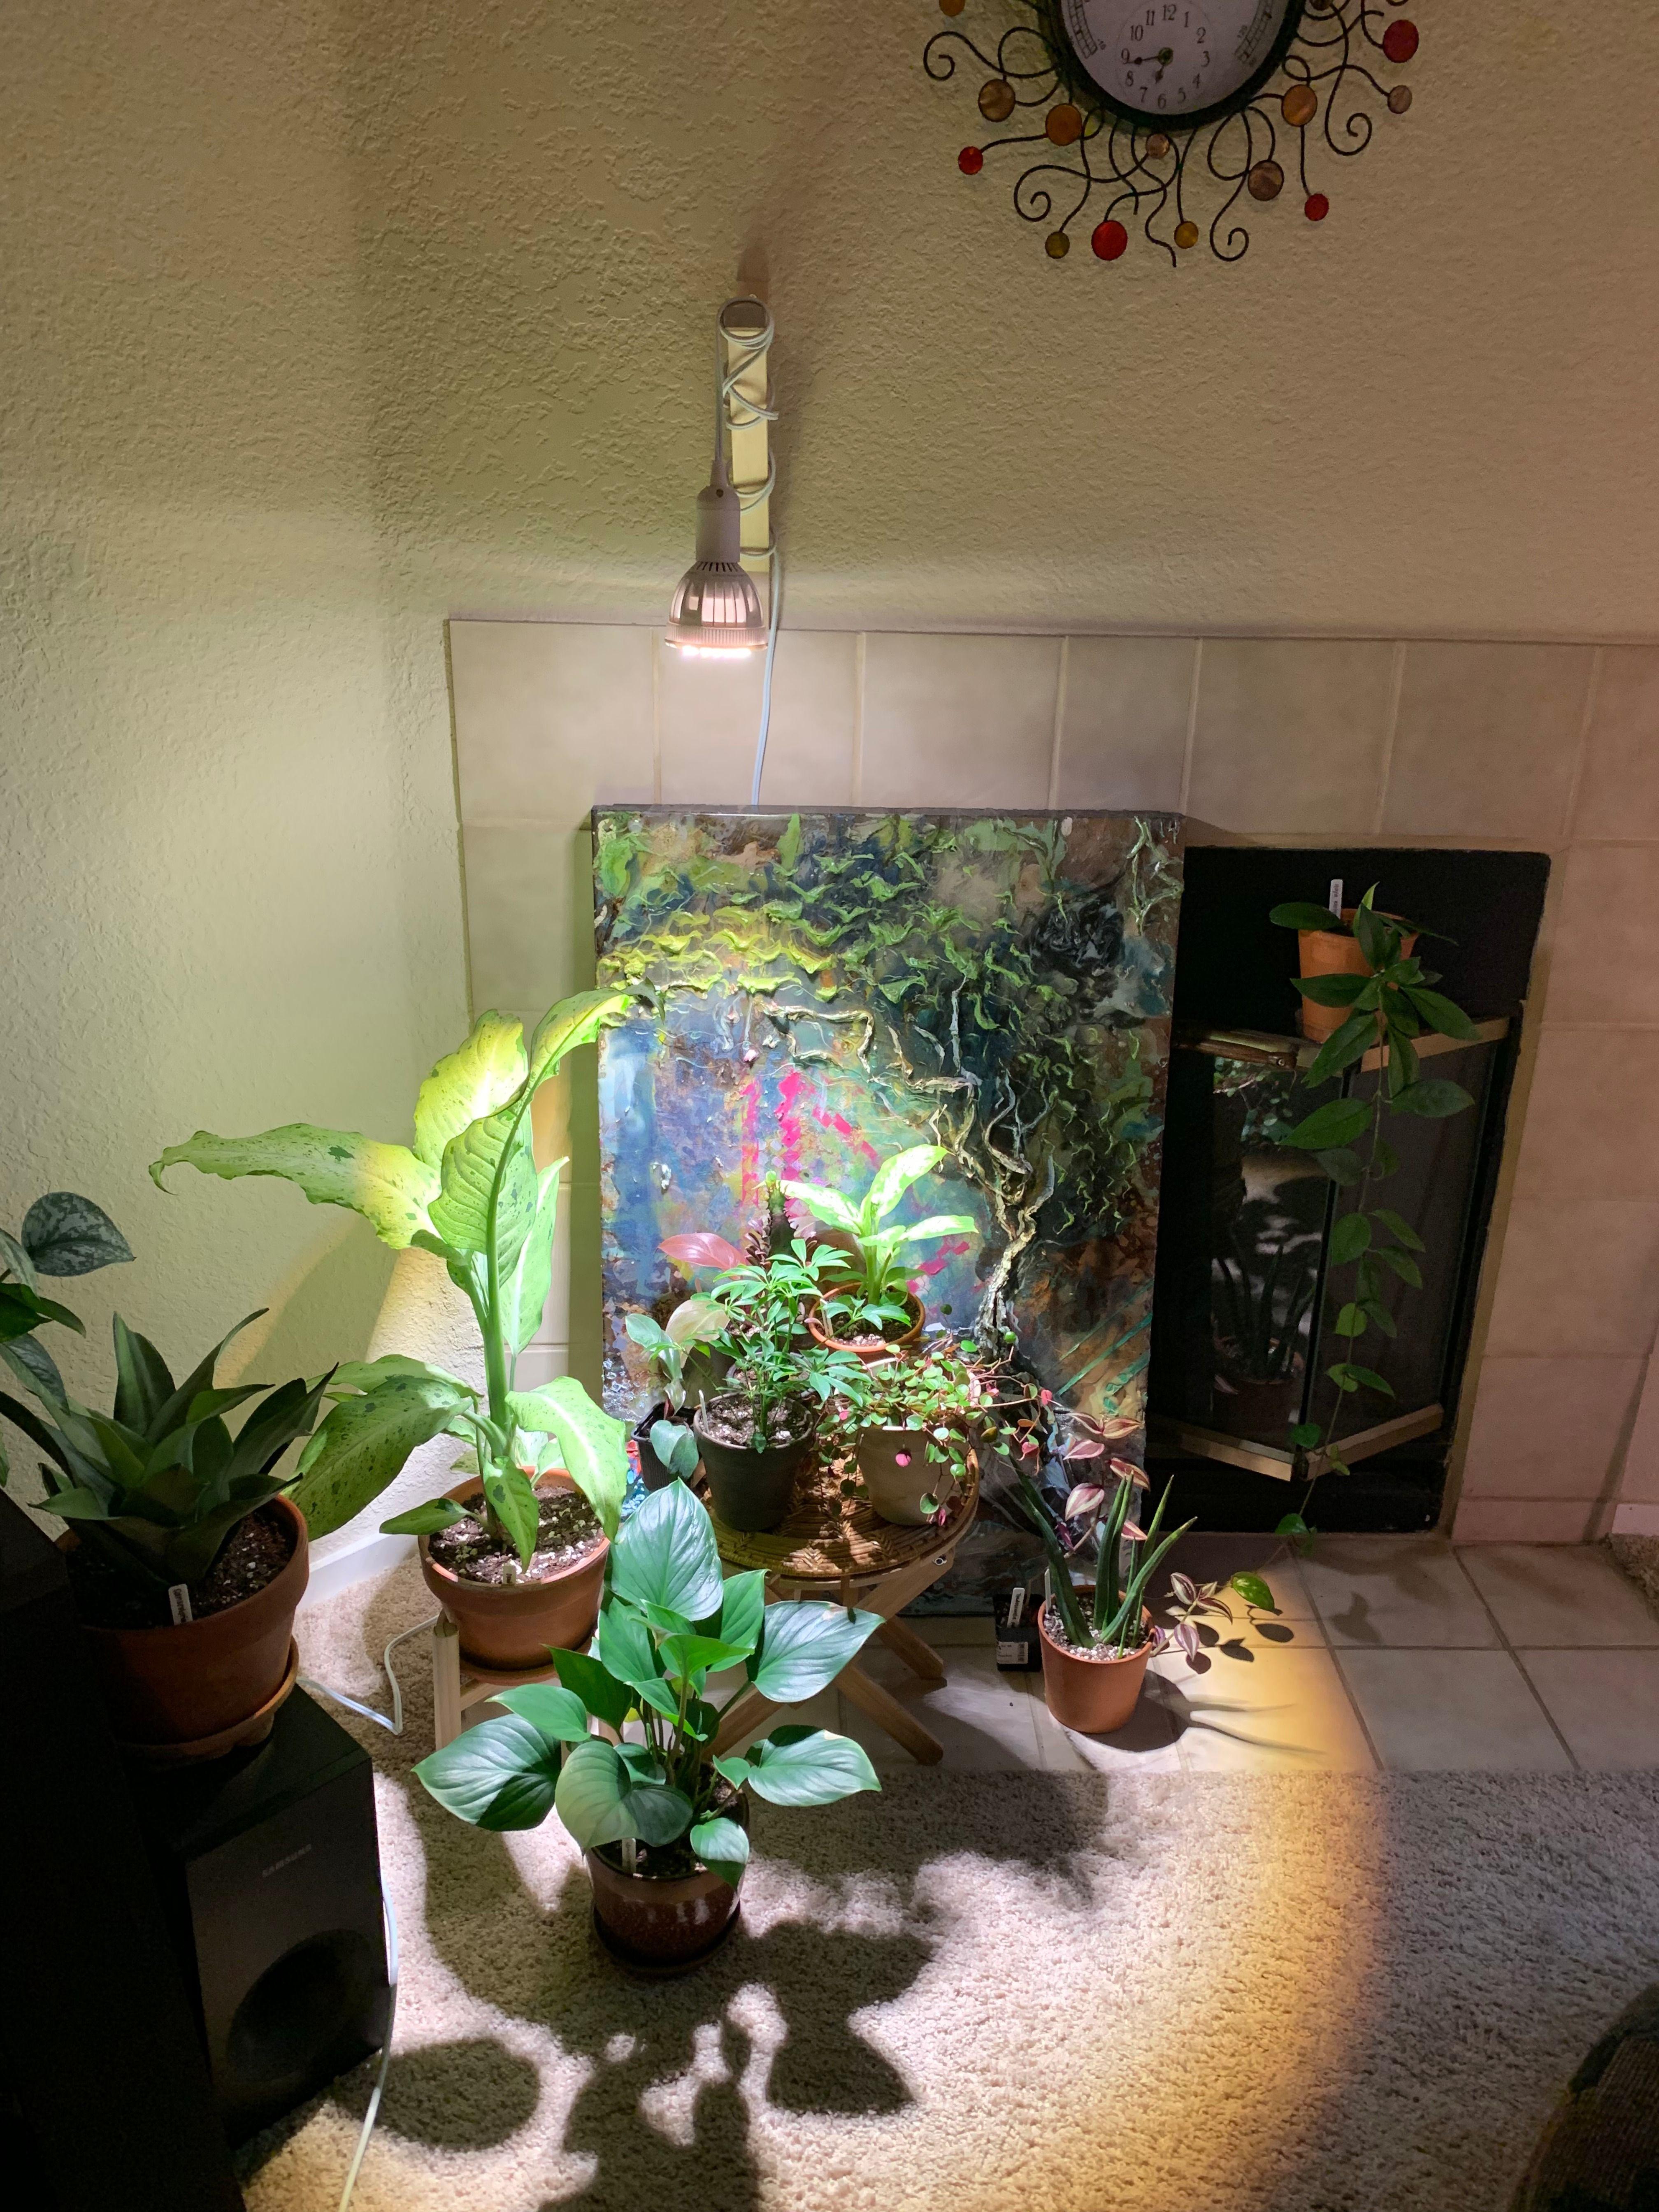 SANSI LED Security Lights, LED Bulbs, Grow Lights Led